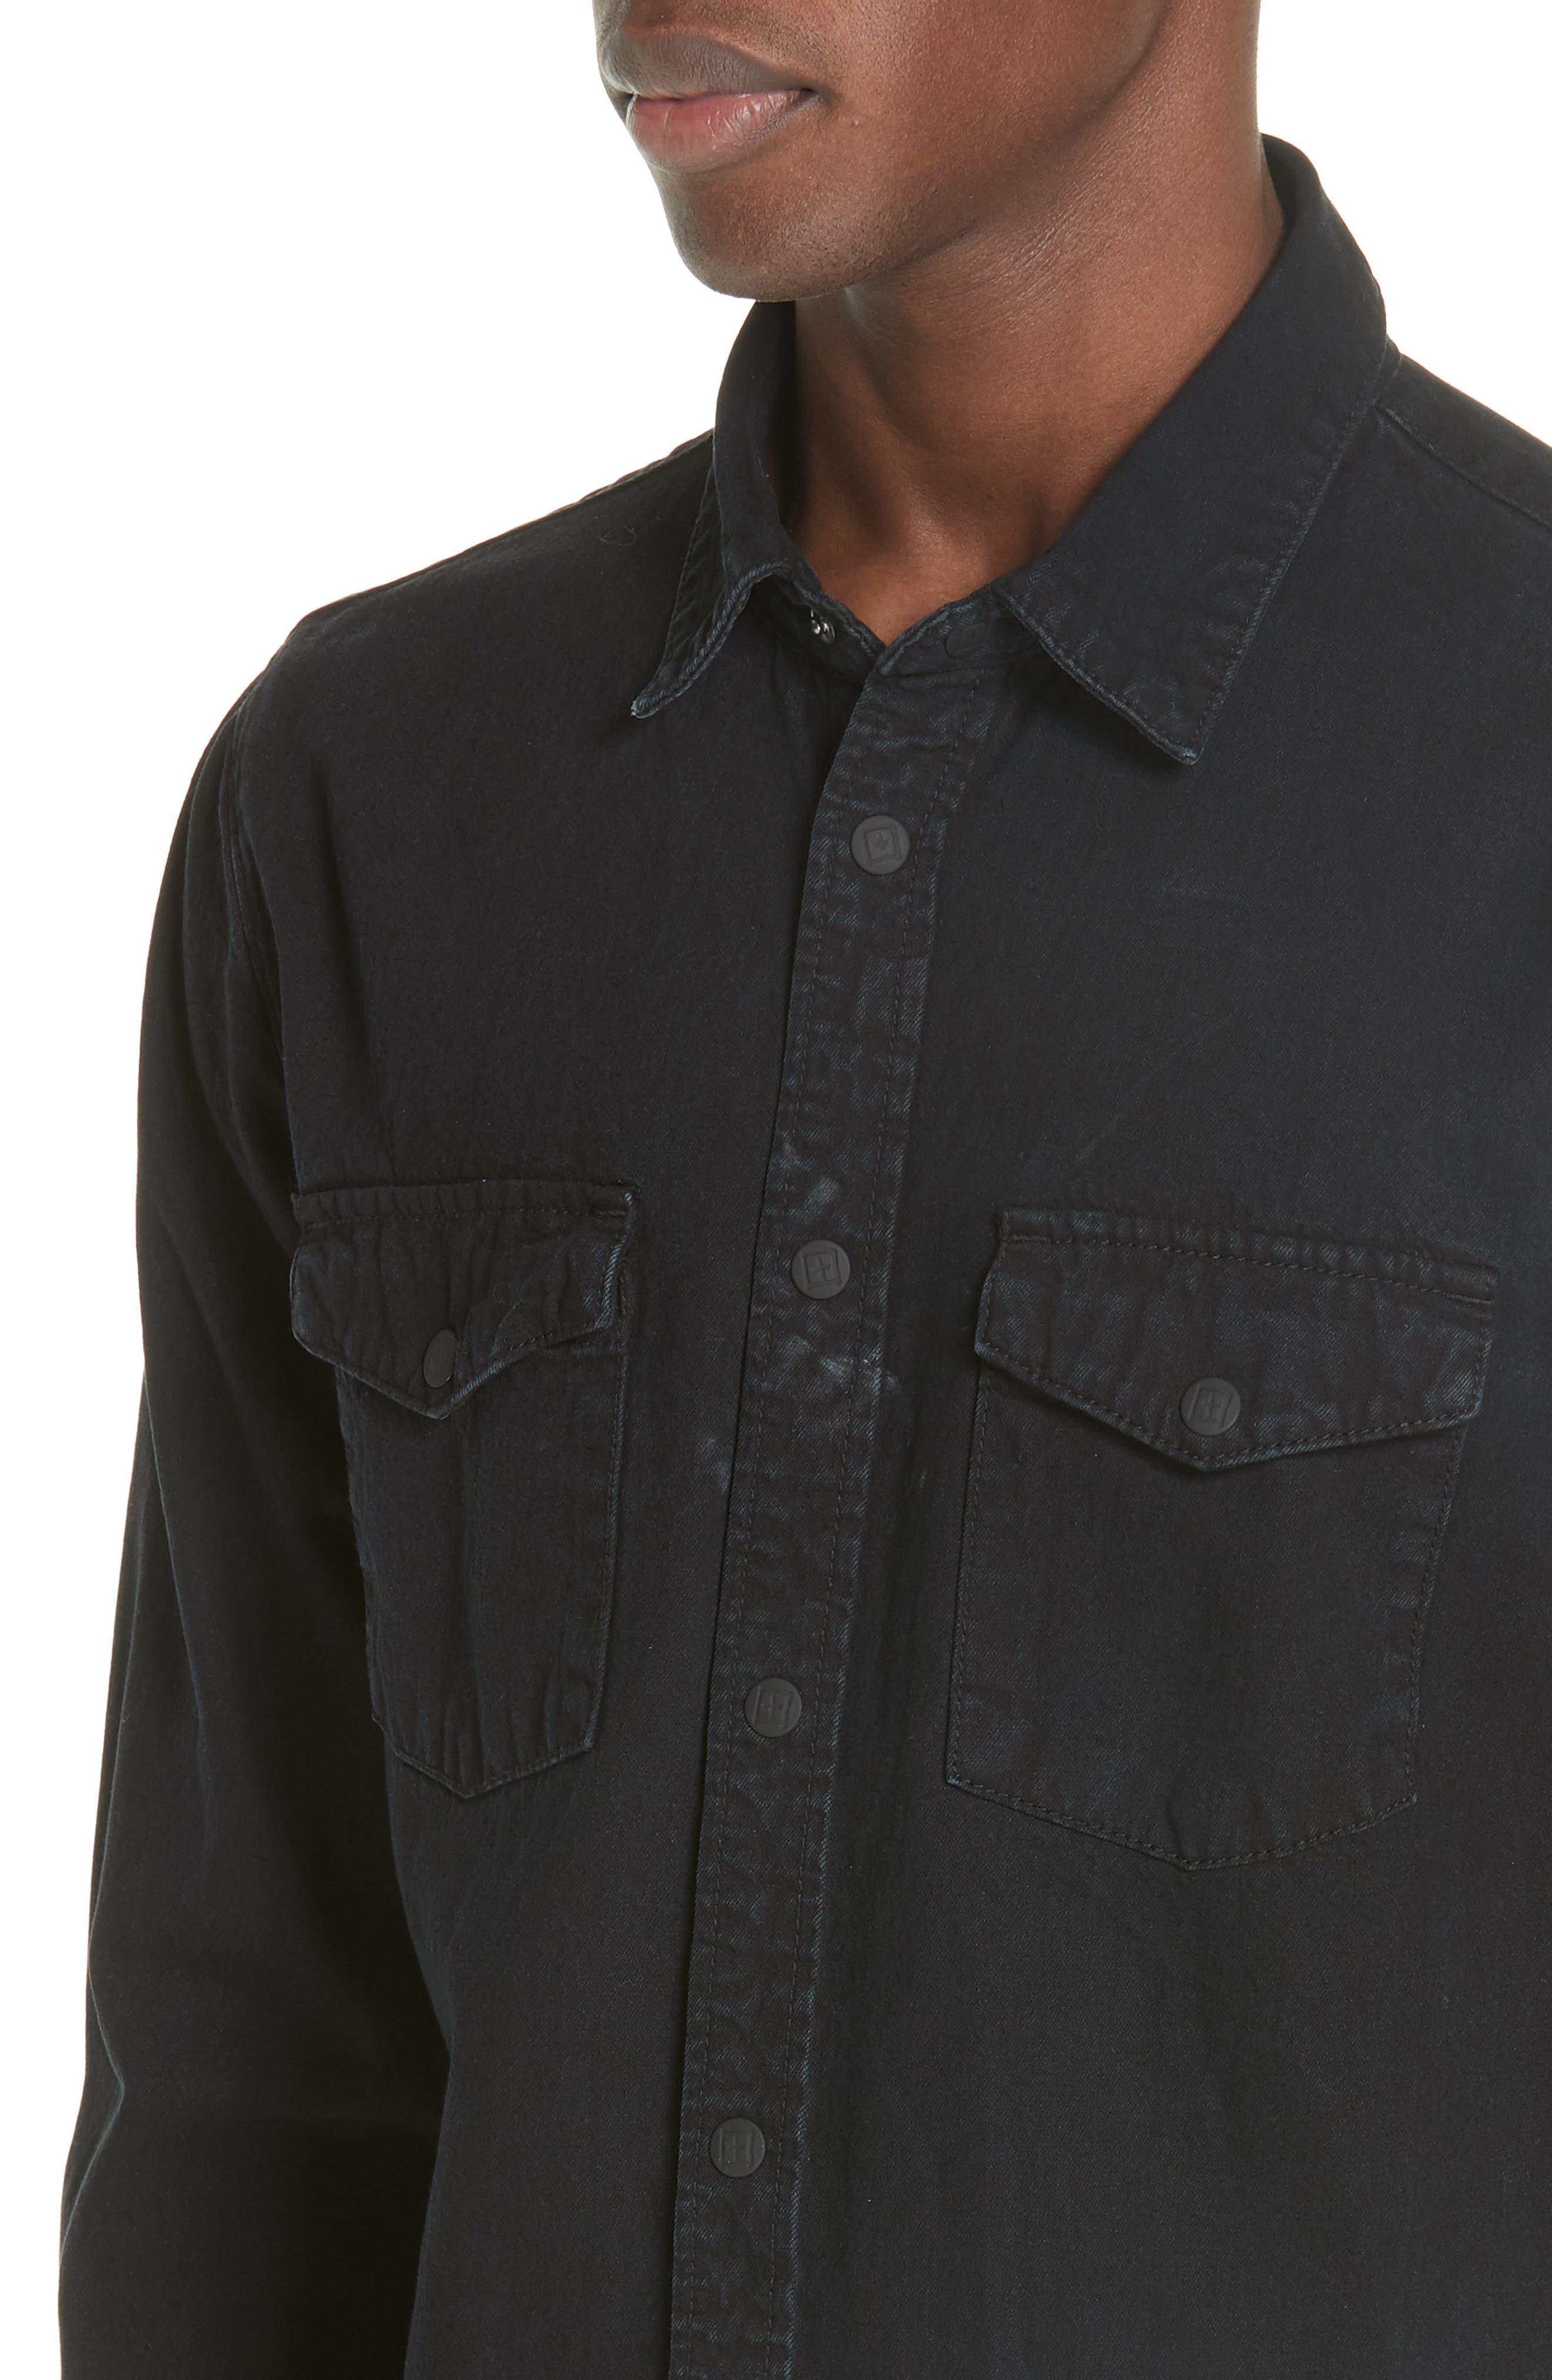 Frontier Work Shirt,                             Alternate thumbnail 2, color,                             BLACK